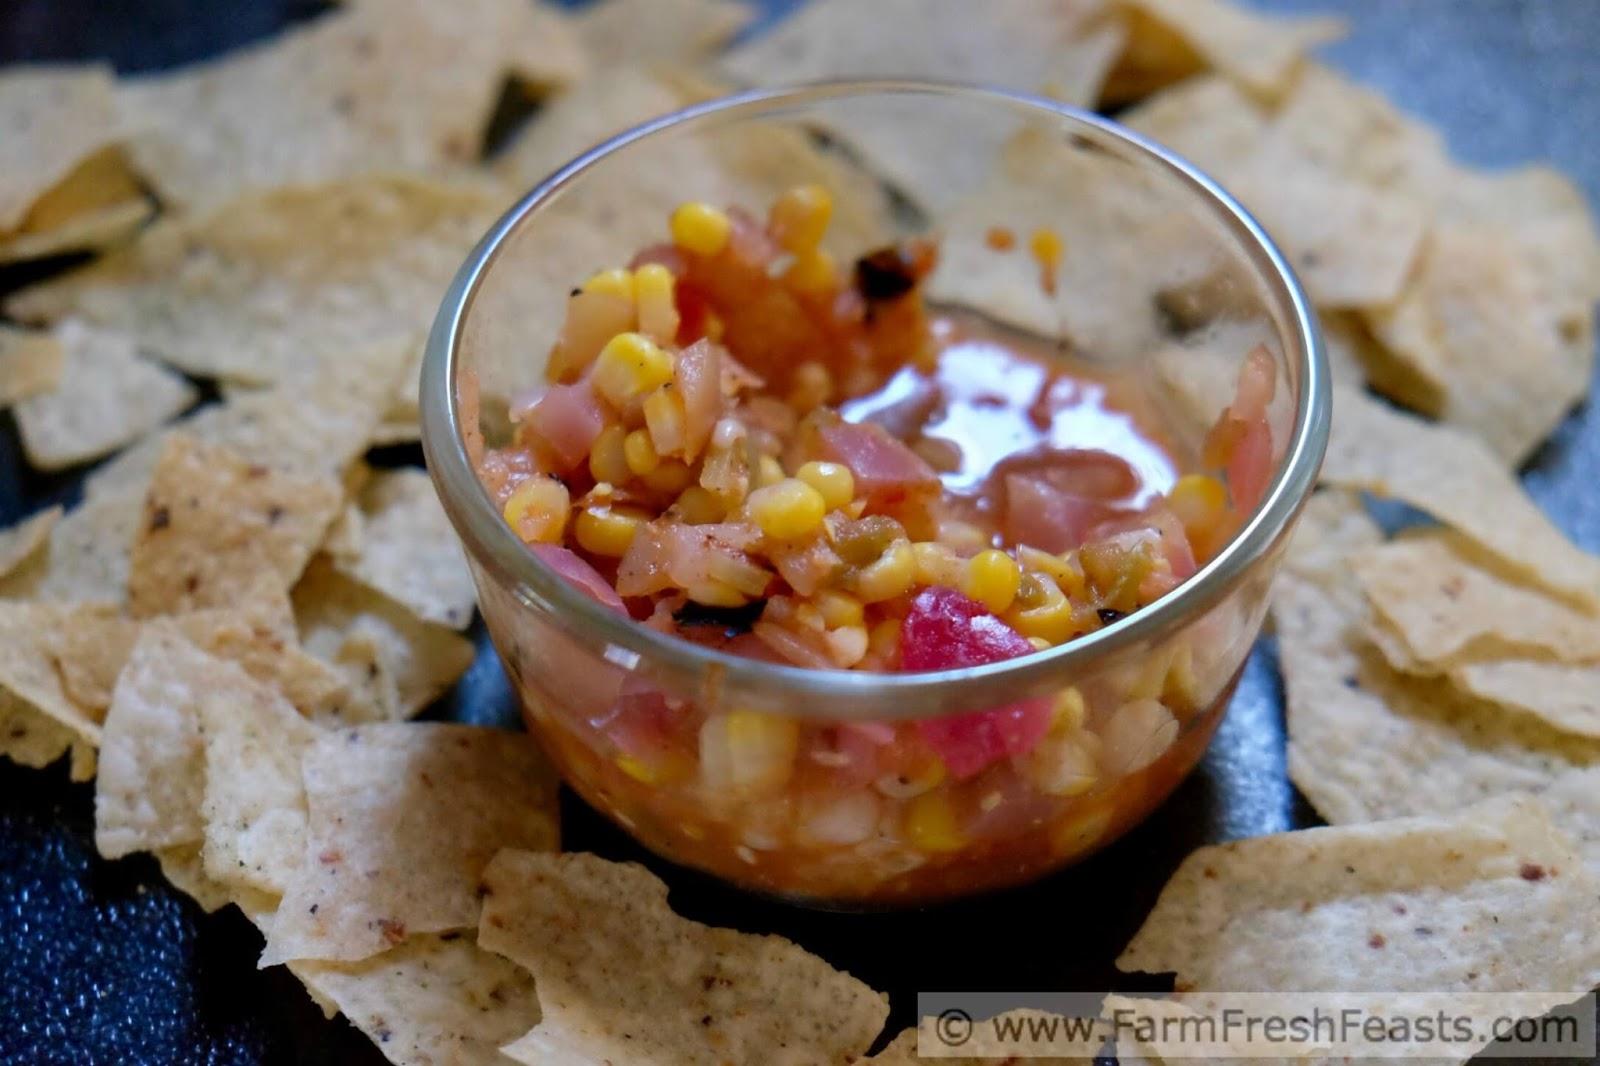 Farm Fresh Feasts: Roasted Corn and Hatch Chile Salsa ...